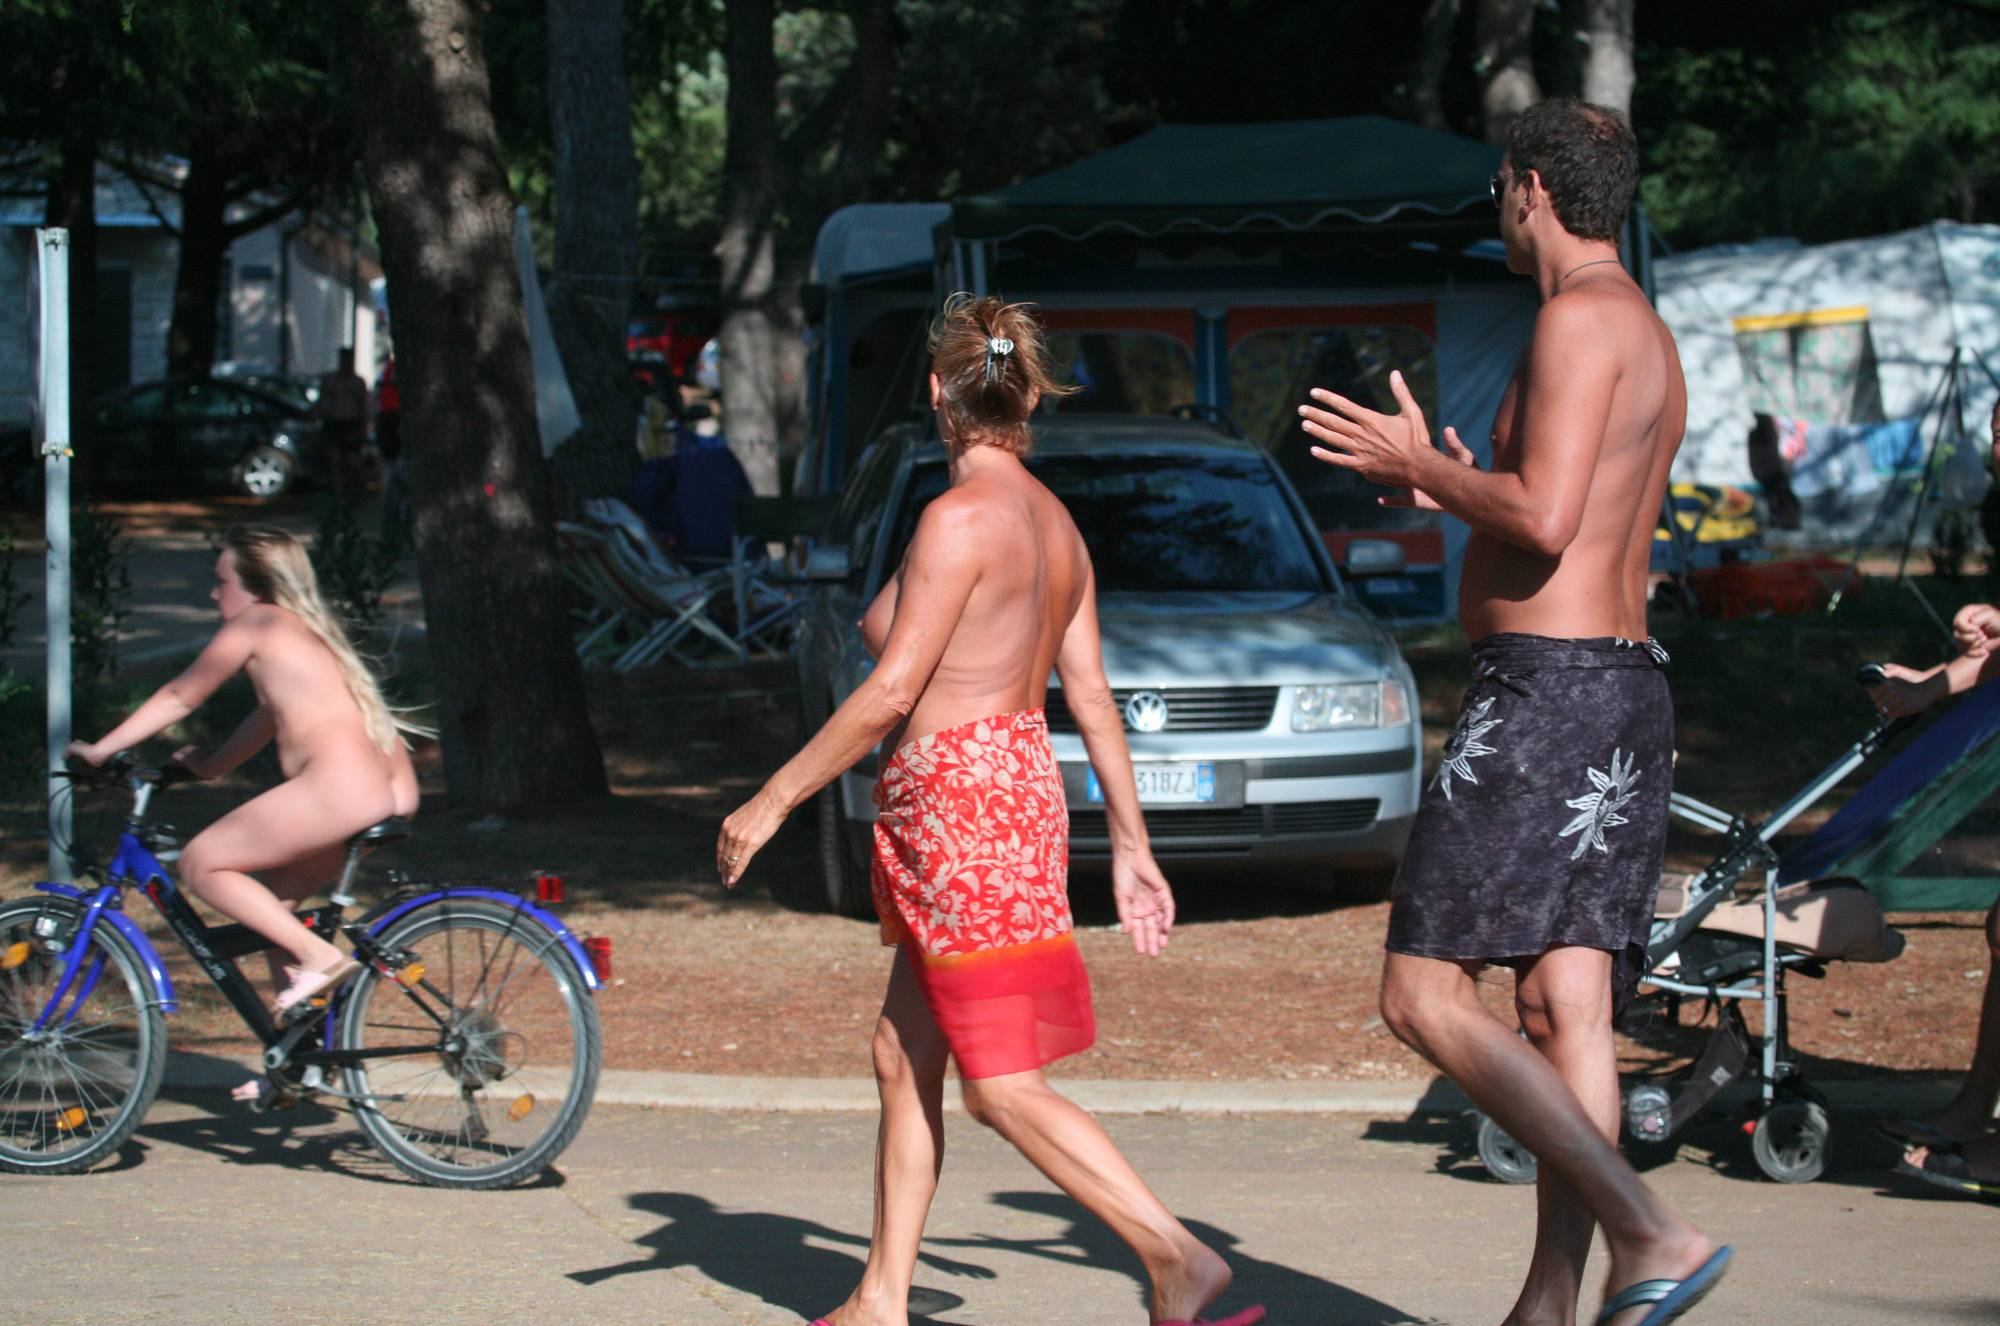 Nudist Pics Pier FKK Park In Motion - 2